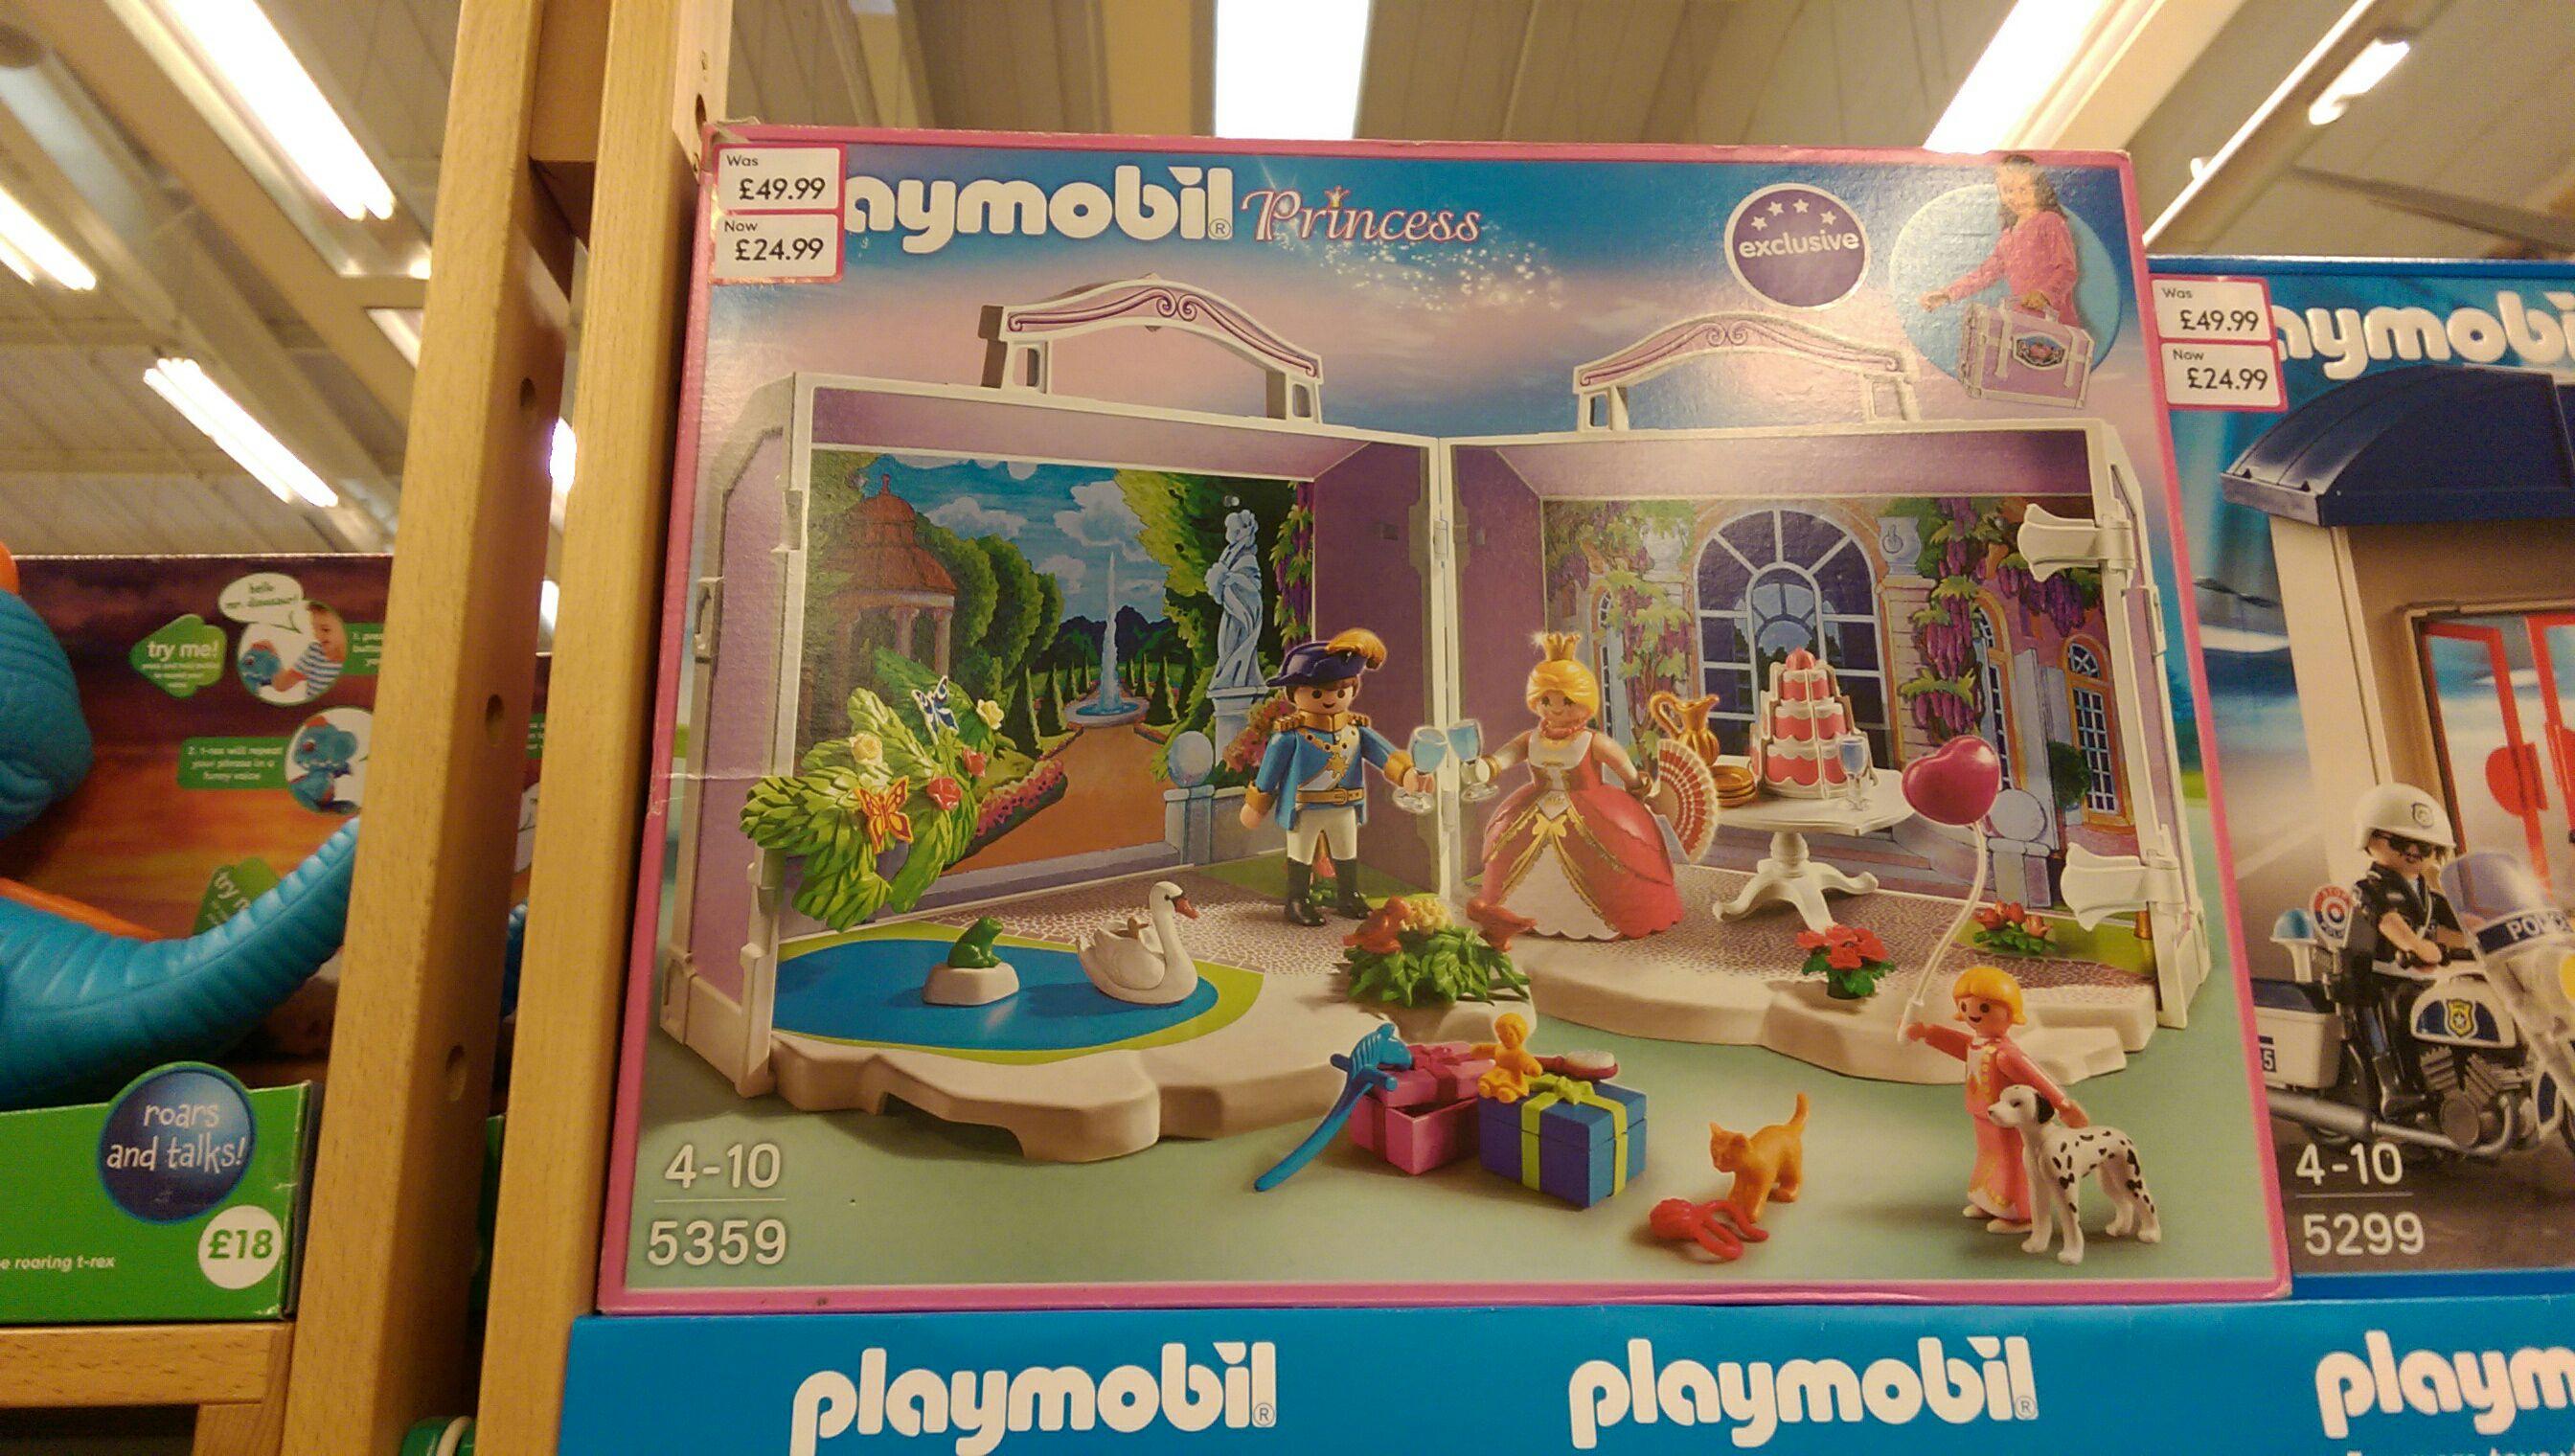 Playmobil 5359 Princess set 24.99 in ELC - Edinburgh hermiston gate